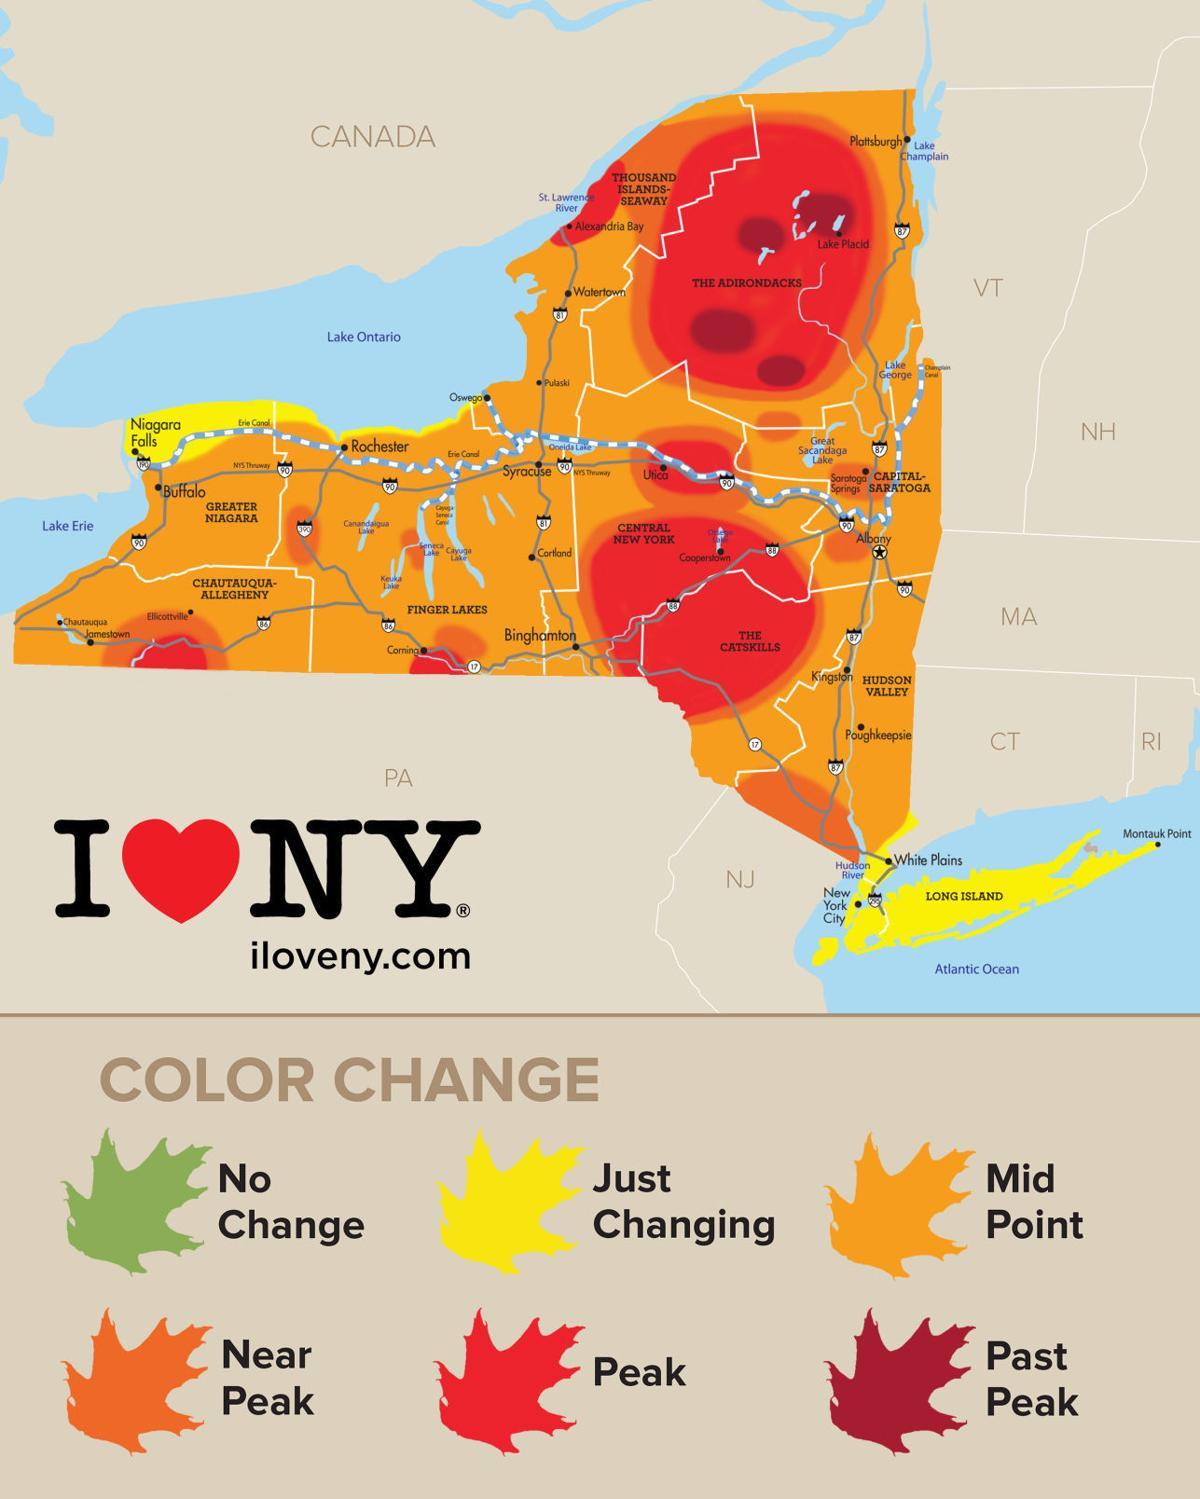 Foliage map Oct. 11 to 17